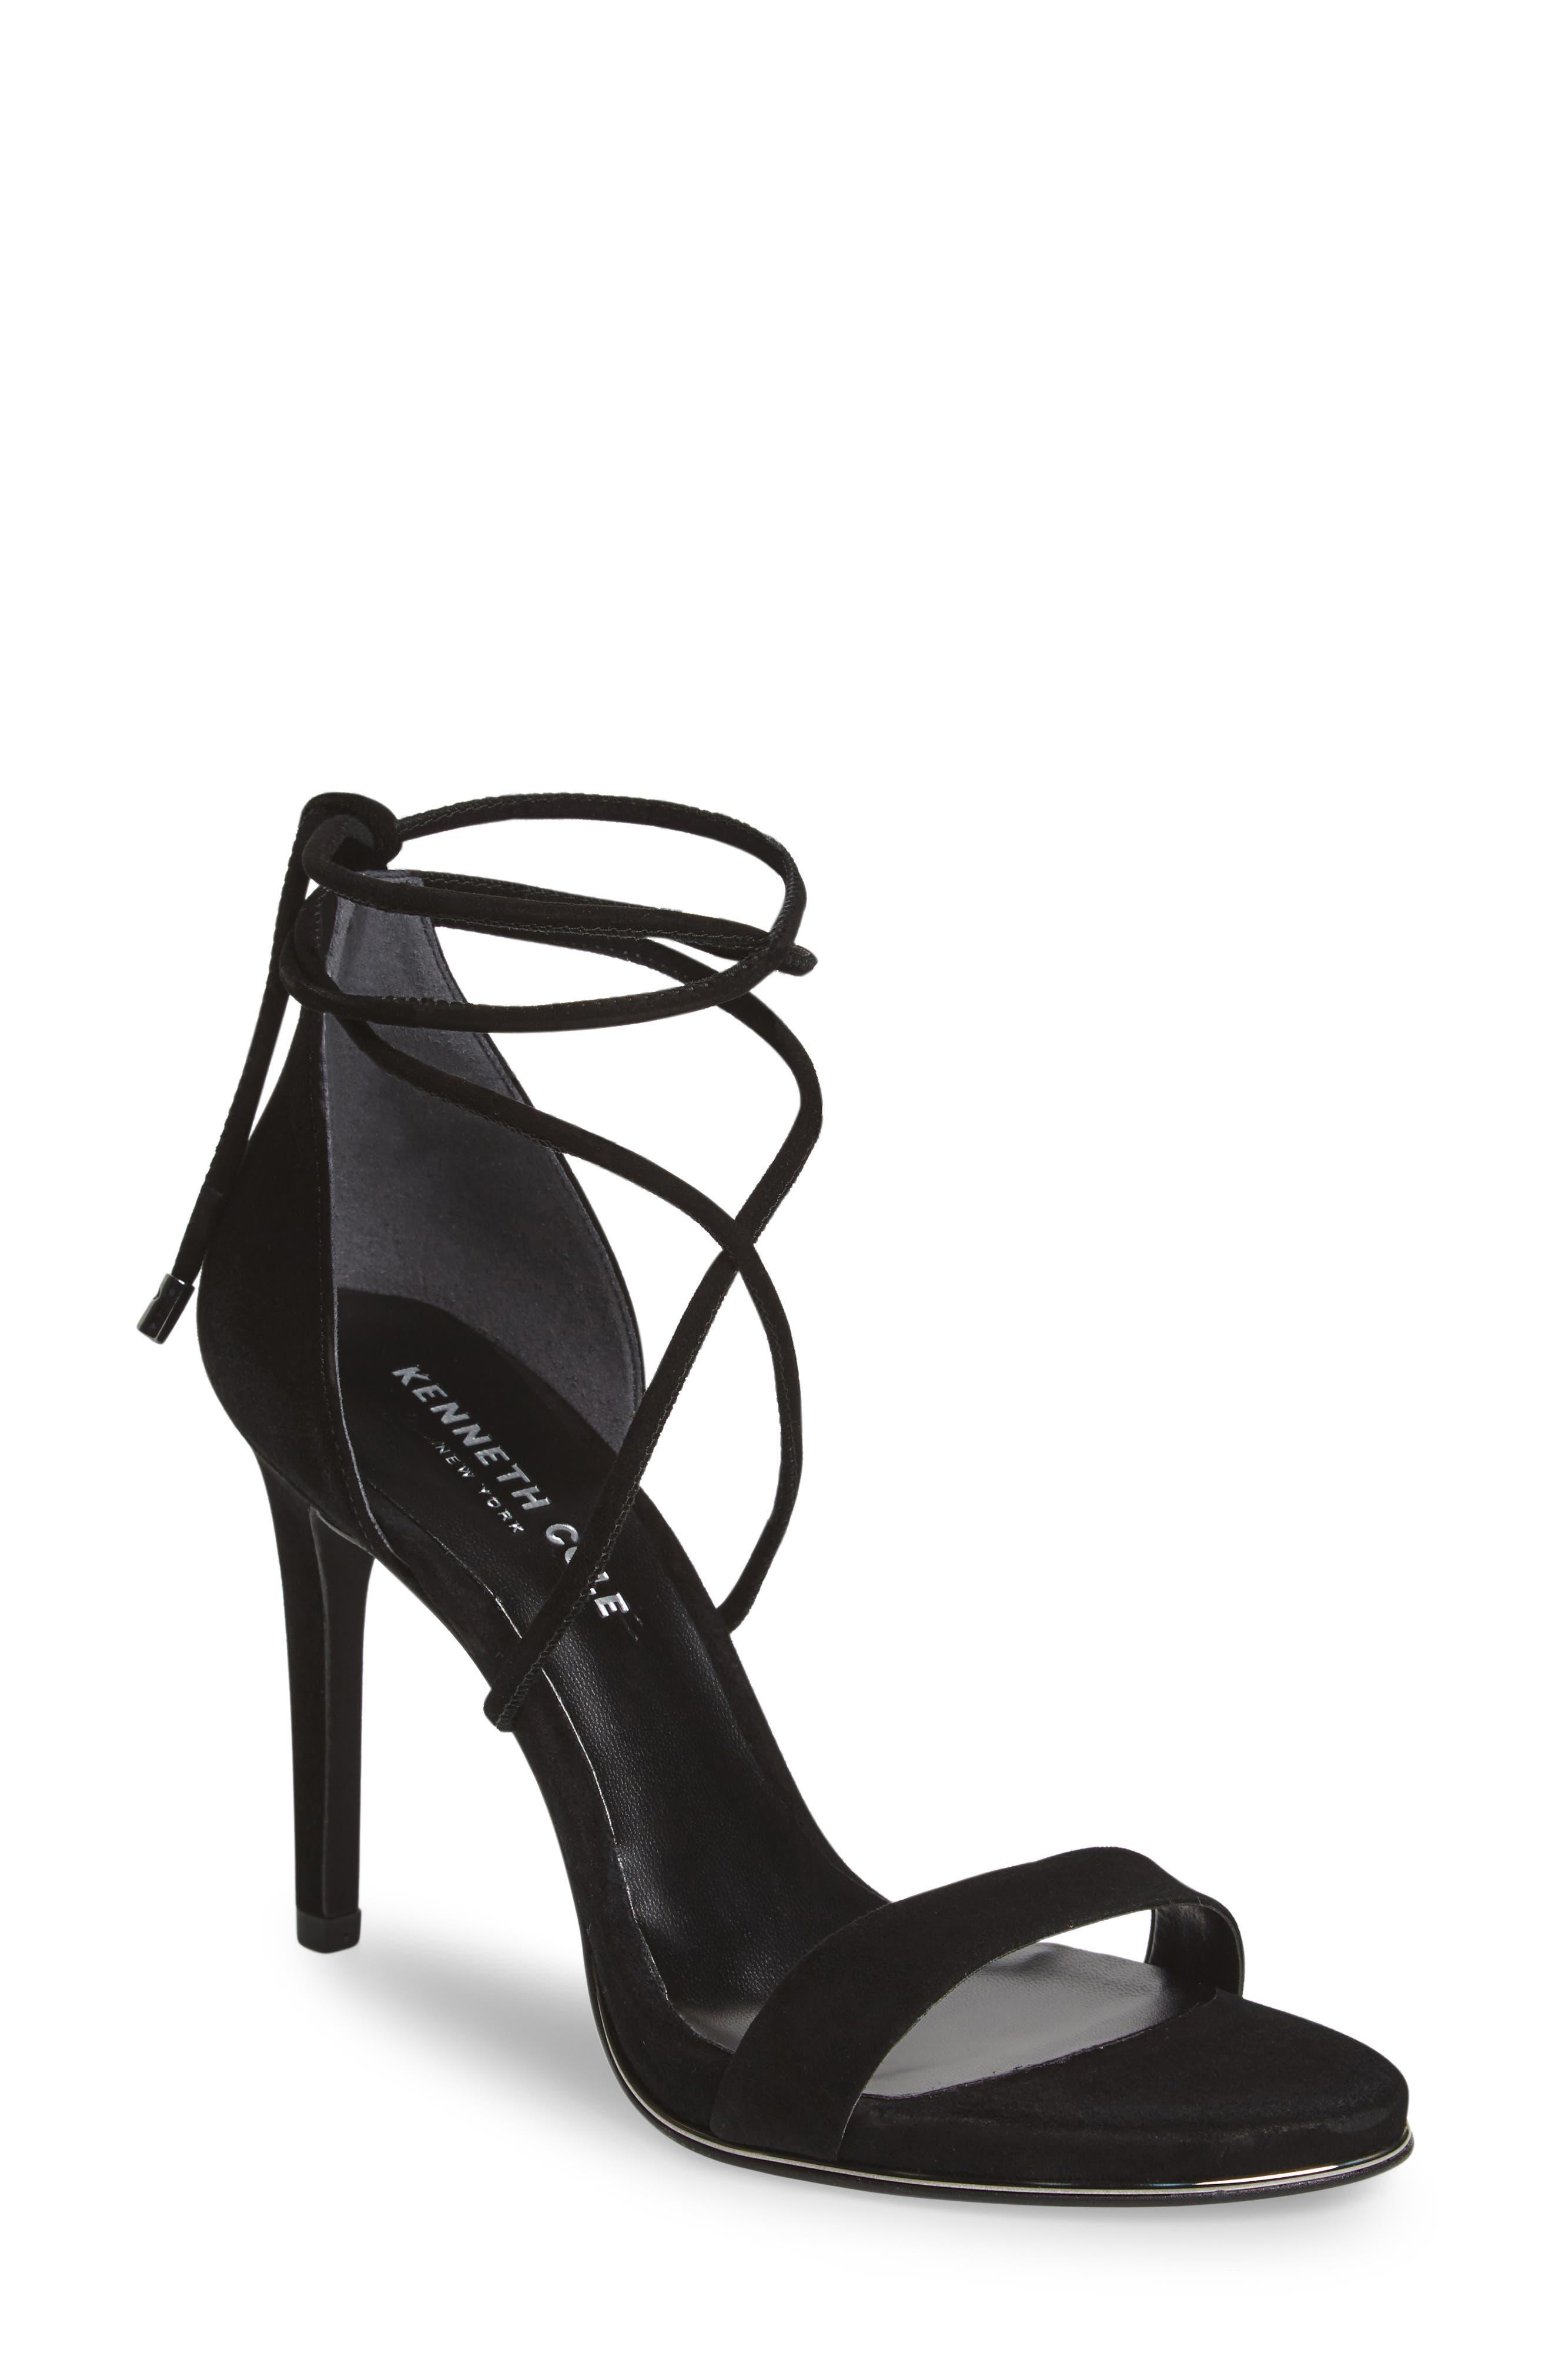 Kenneth Cole New York Berry Wraparound Sandal, Black